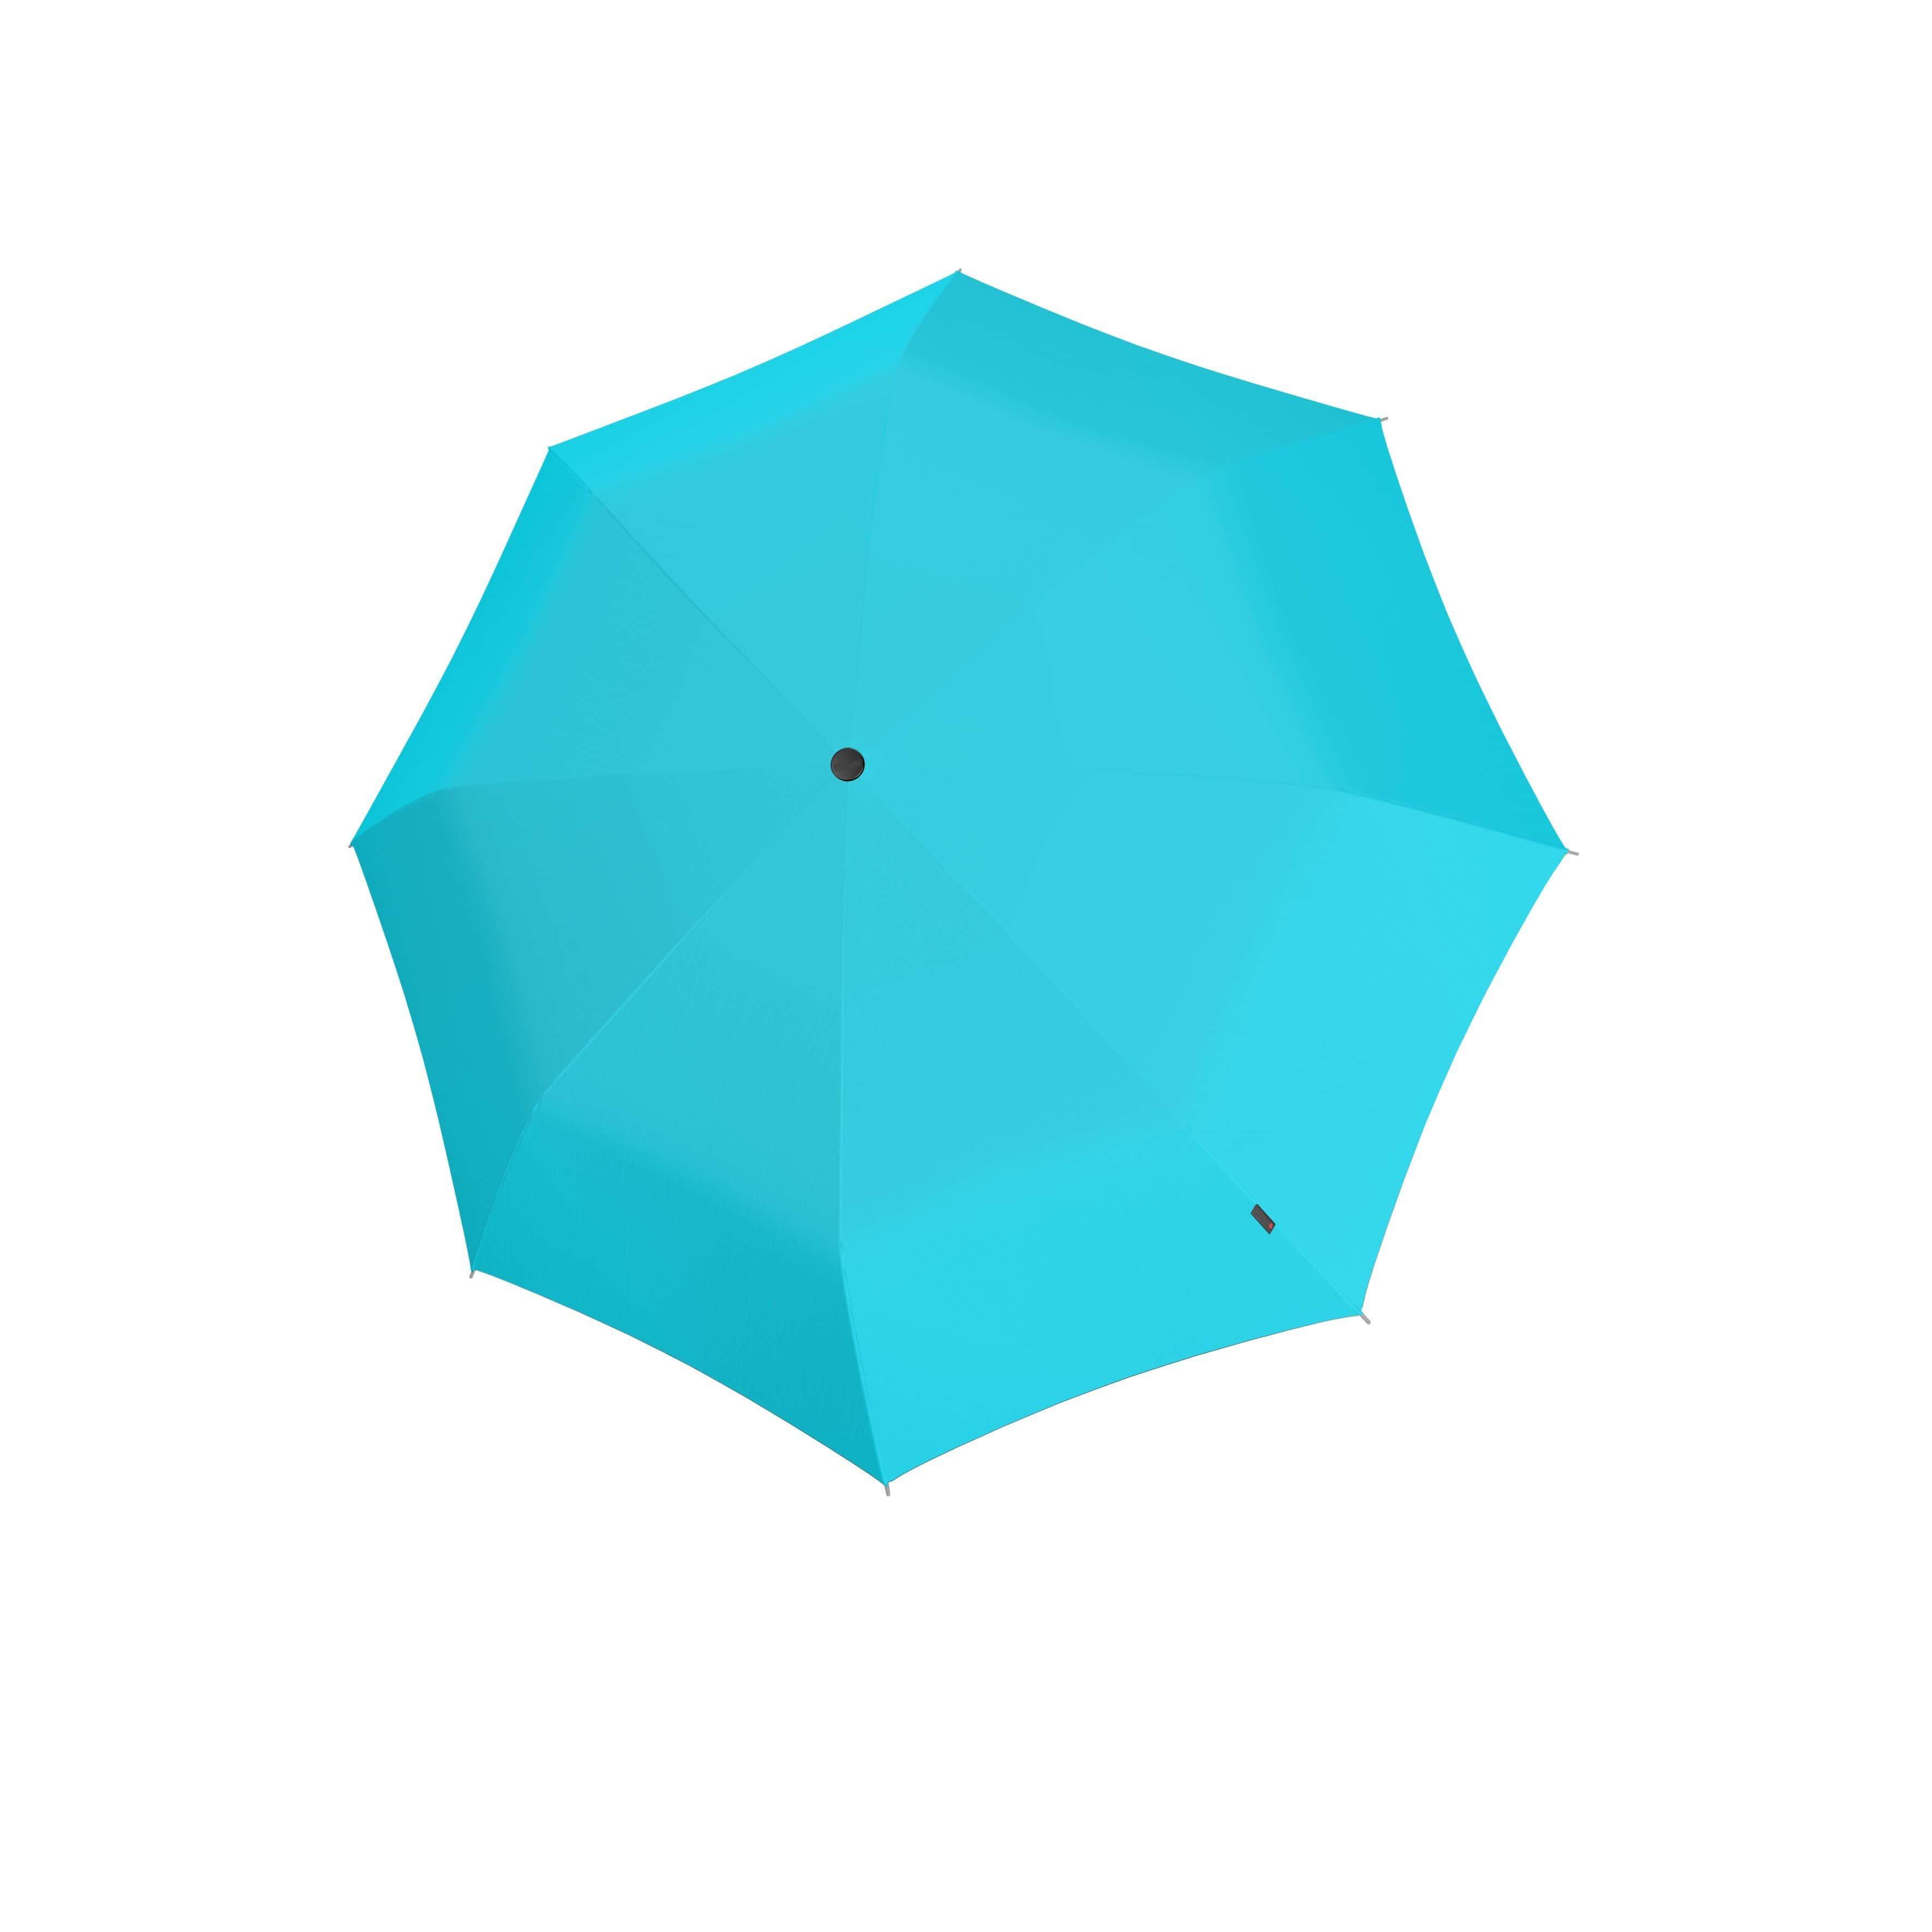 Knirps Umbrella U.090 Ultra Light XXL Manual Compact - photo 2